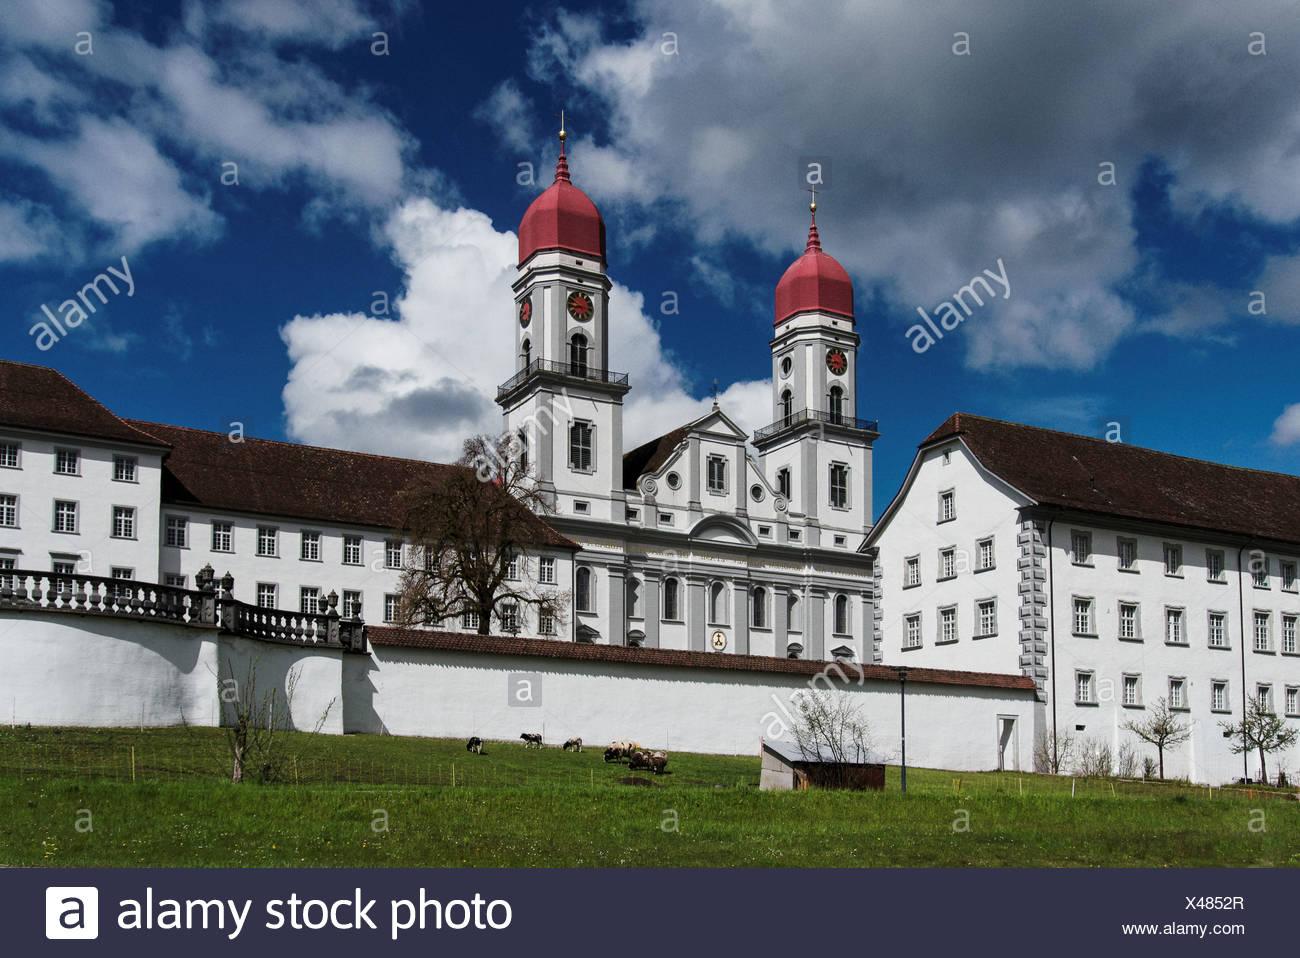 Christianity, canton, Lucerne, Catholic, church, cloister, religion, Switzerland, Europe, Saint Urban, vita communis - Stock Image